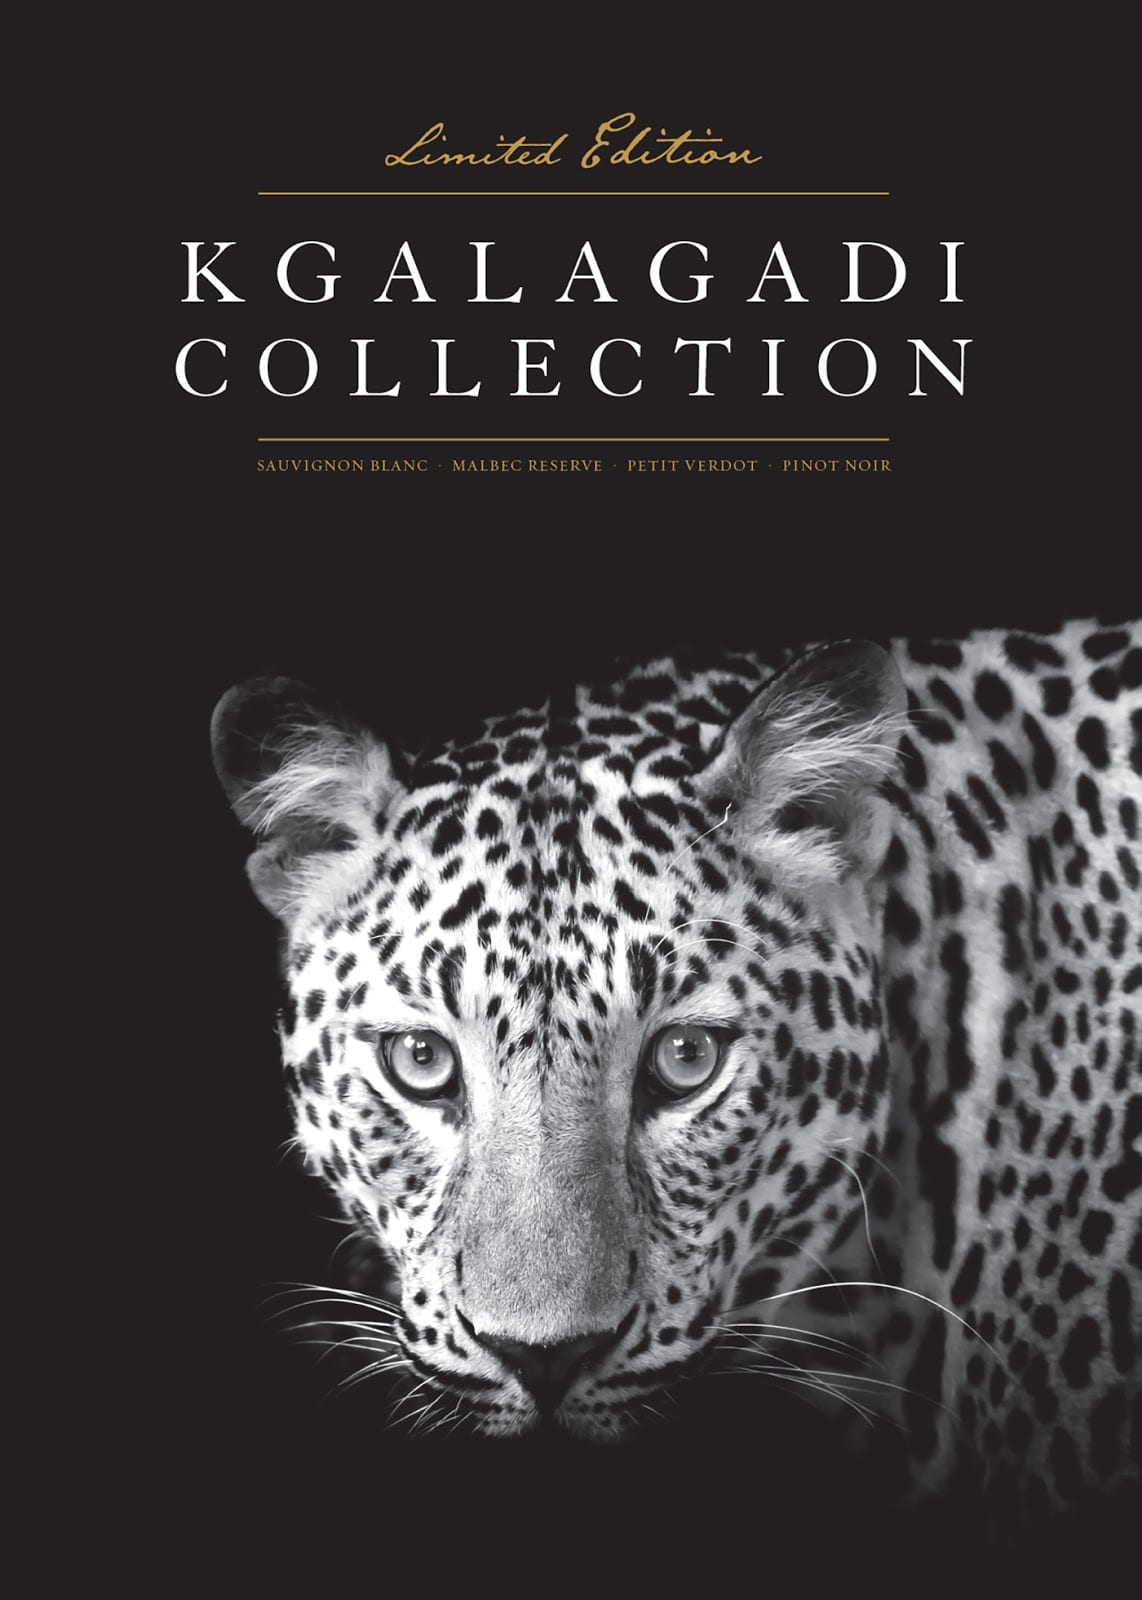 Kgalagadi Wines 05 - Unikátní design Kgalagadi Wines